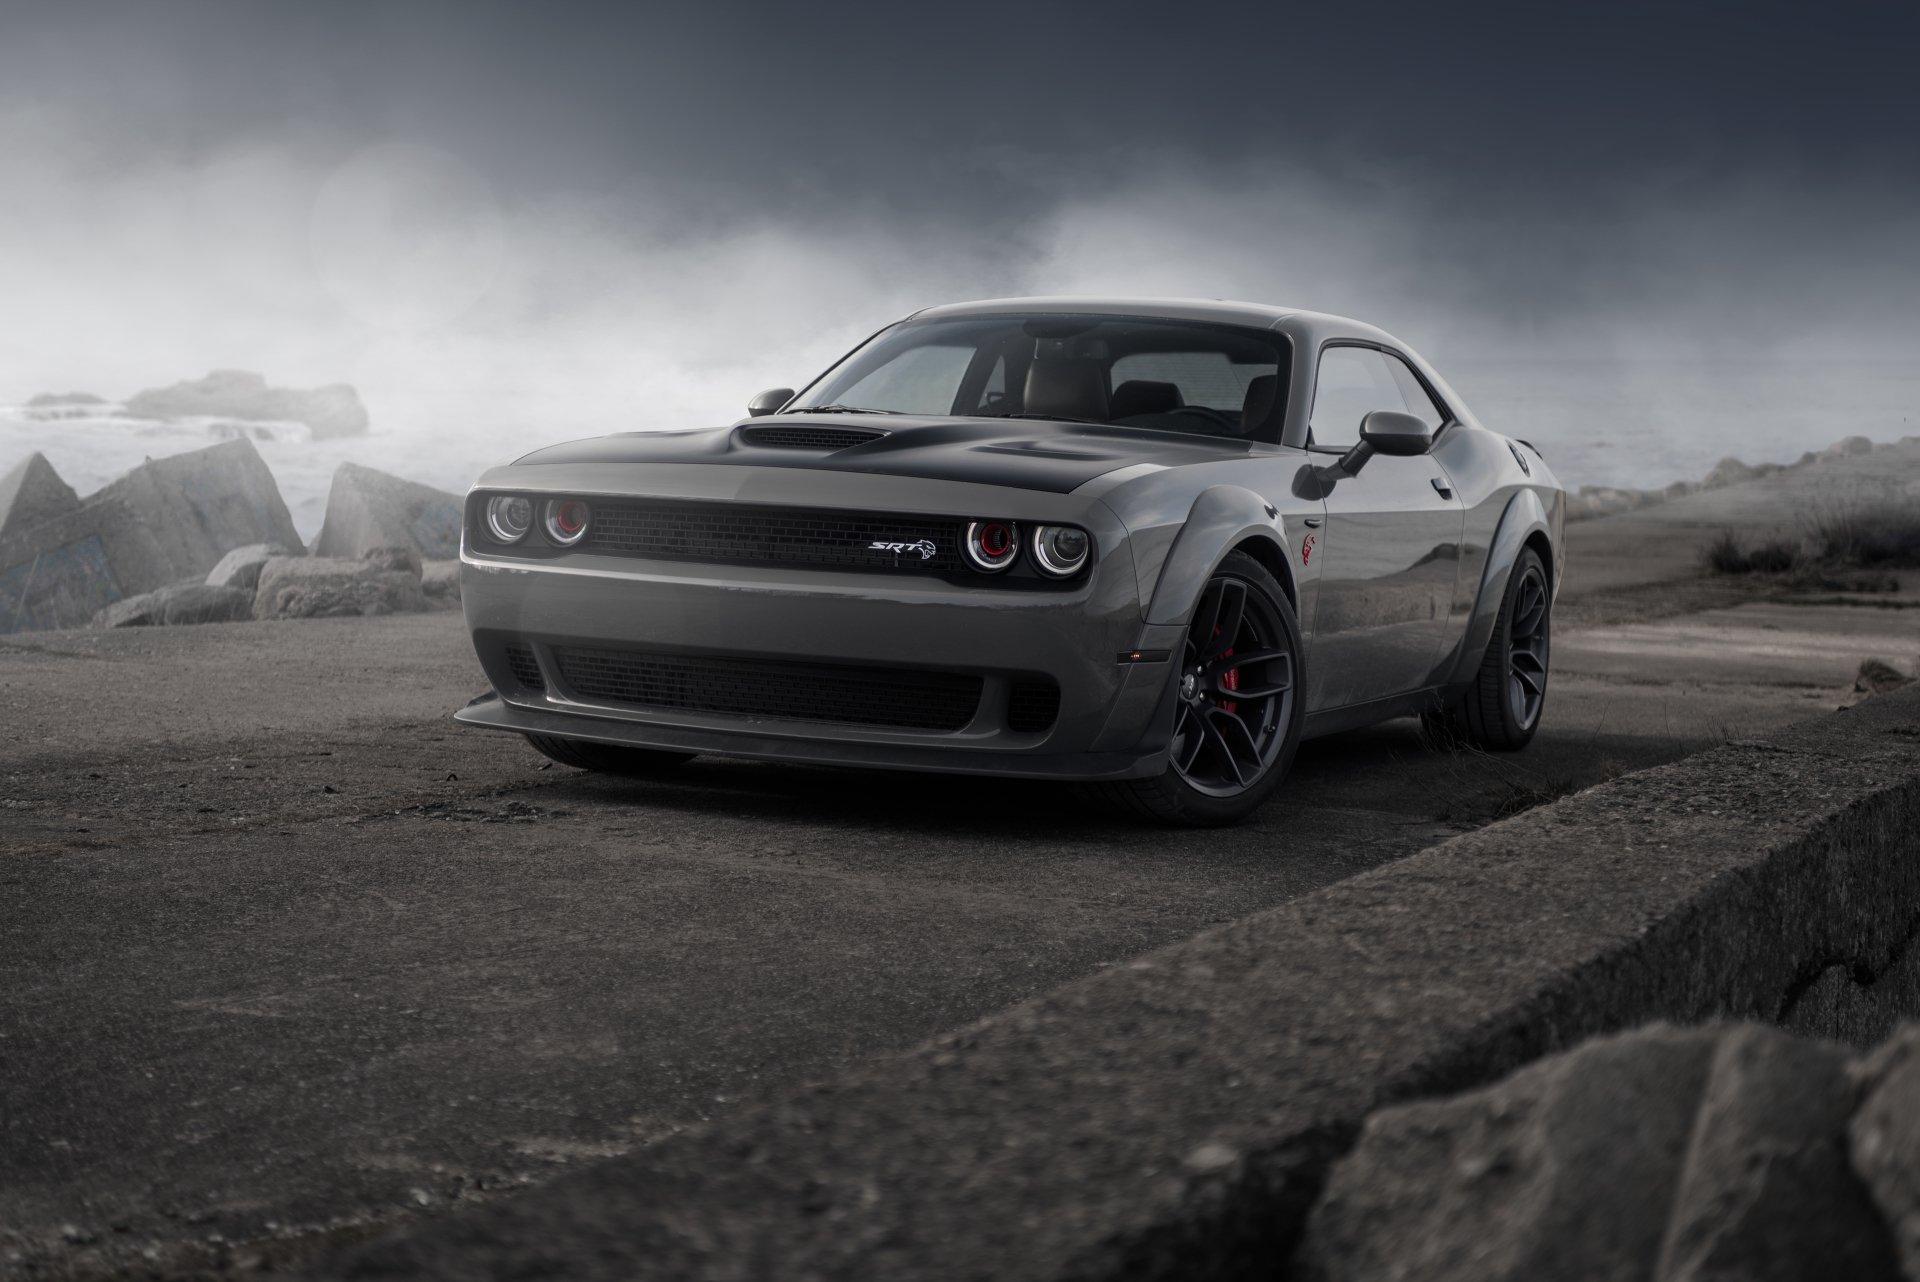 1 4k Ultra Hd Dodge Challenger Srt Demon Wallpapers Background Images Wallpaper Abyss